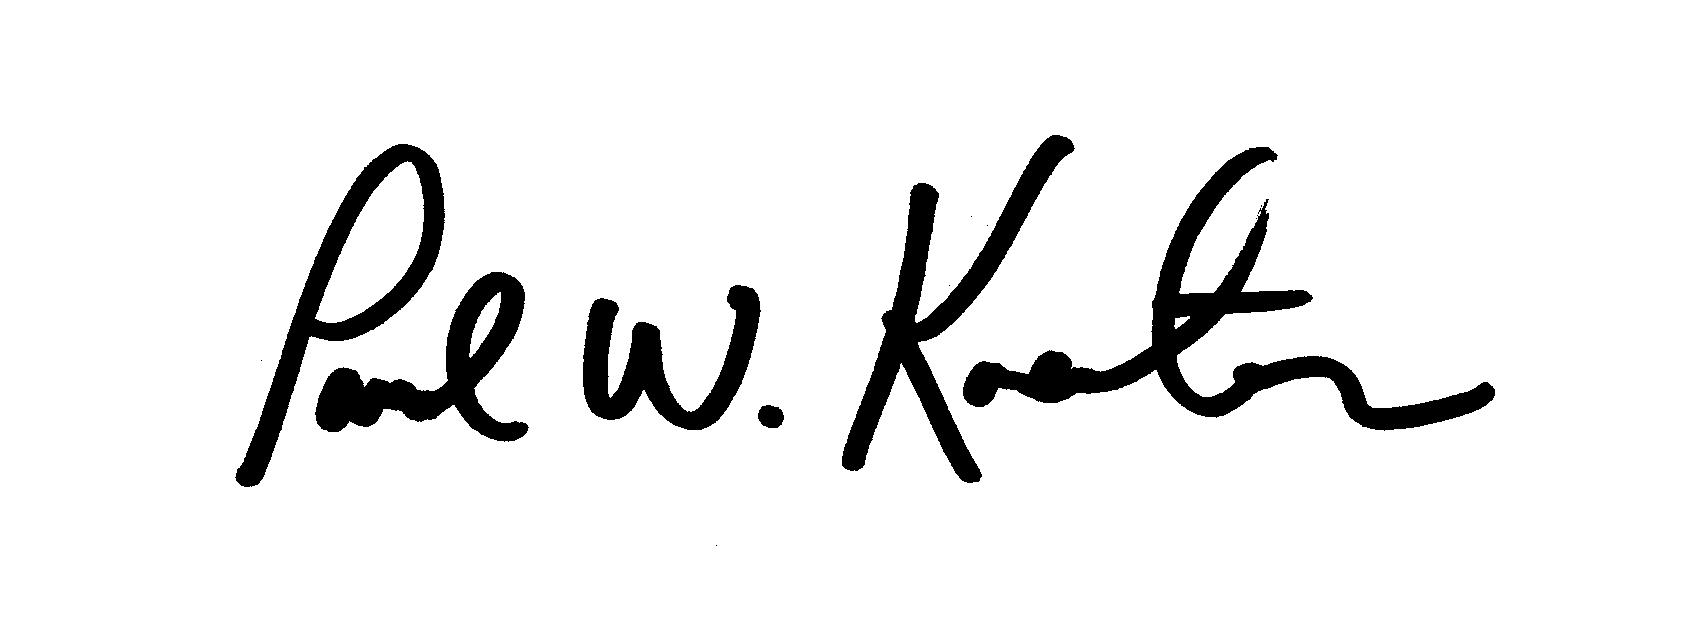 Paul Koester's Signature